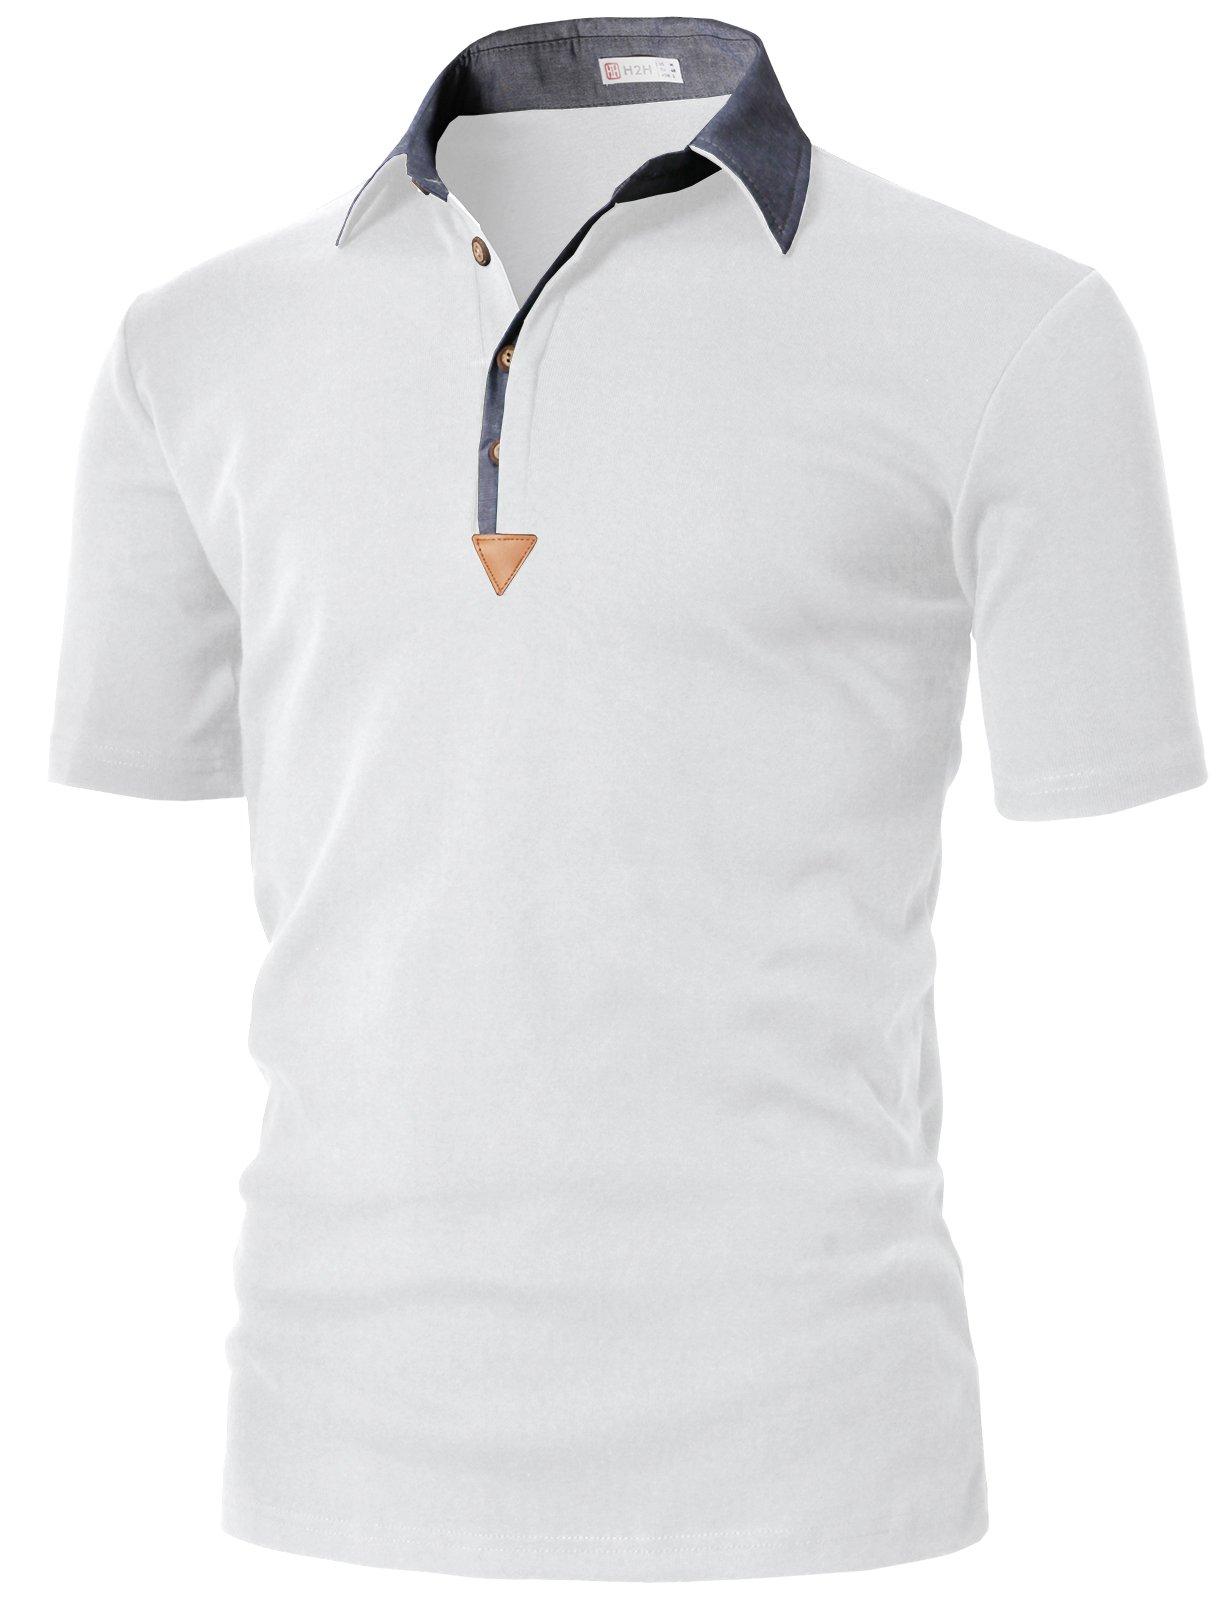 d6322138 Galleon - H2H Mens Casual Collar Polo Shirts White US 2XL/Asia 3XL  (KMTTS0553)